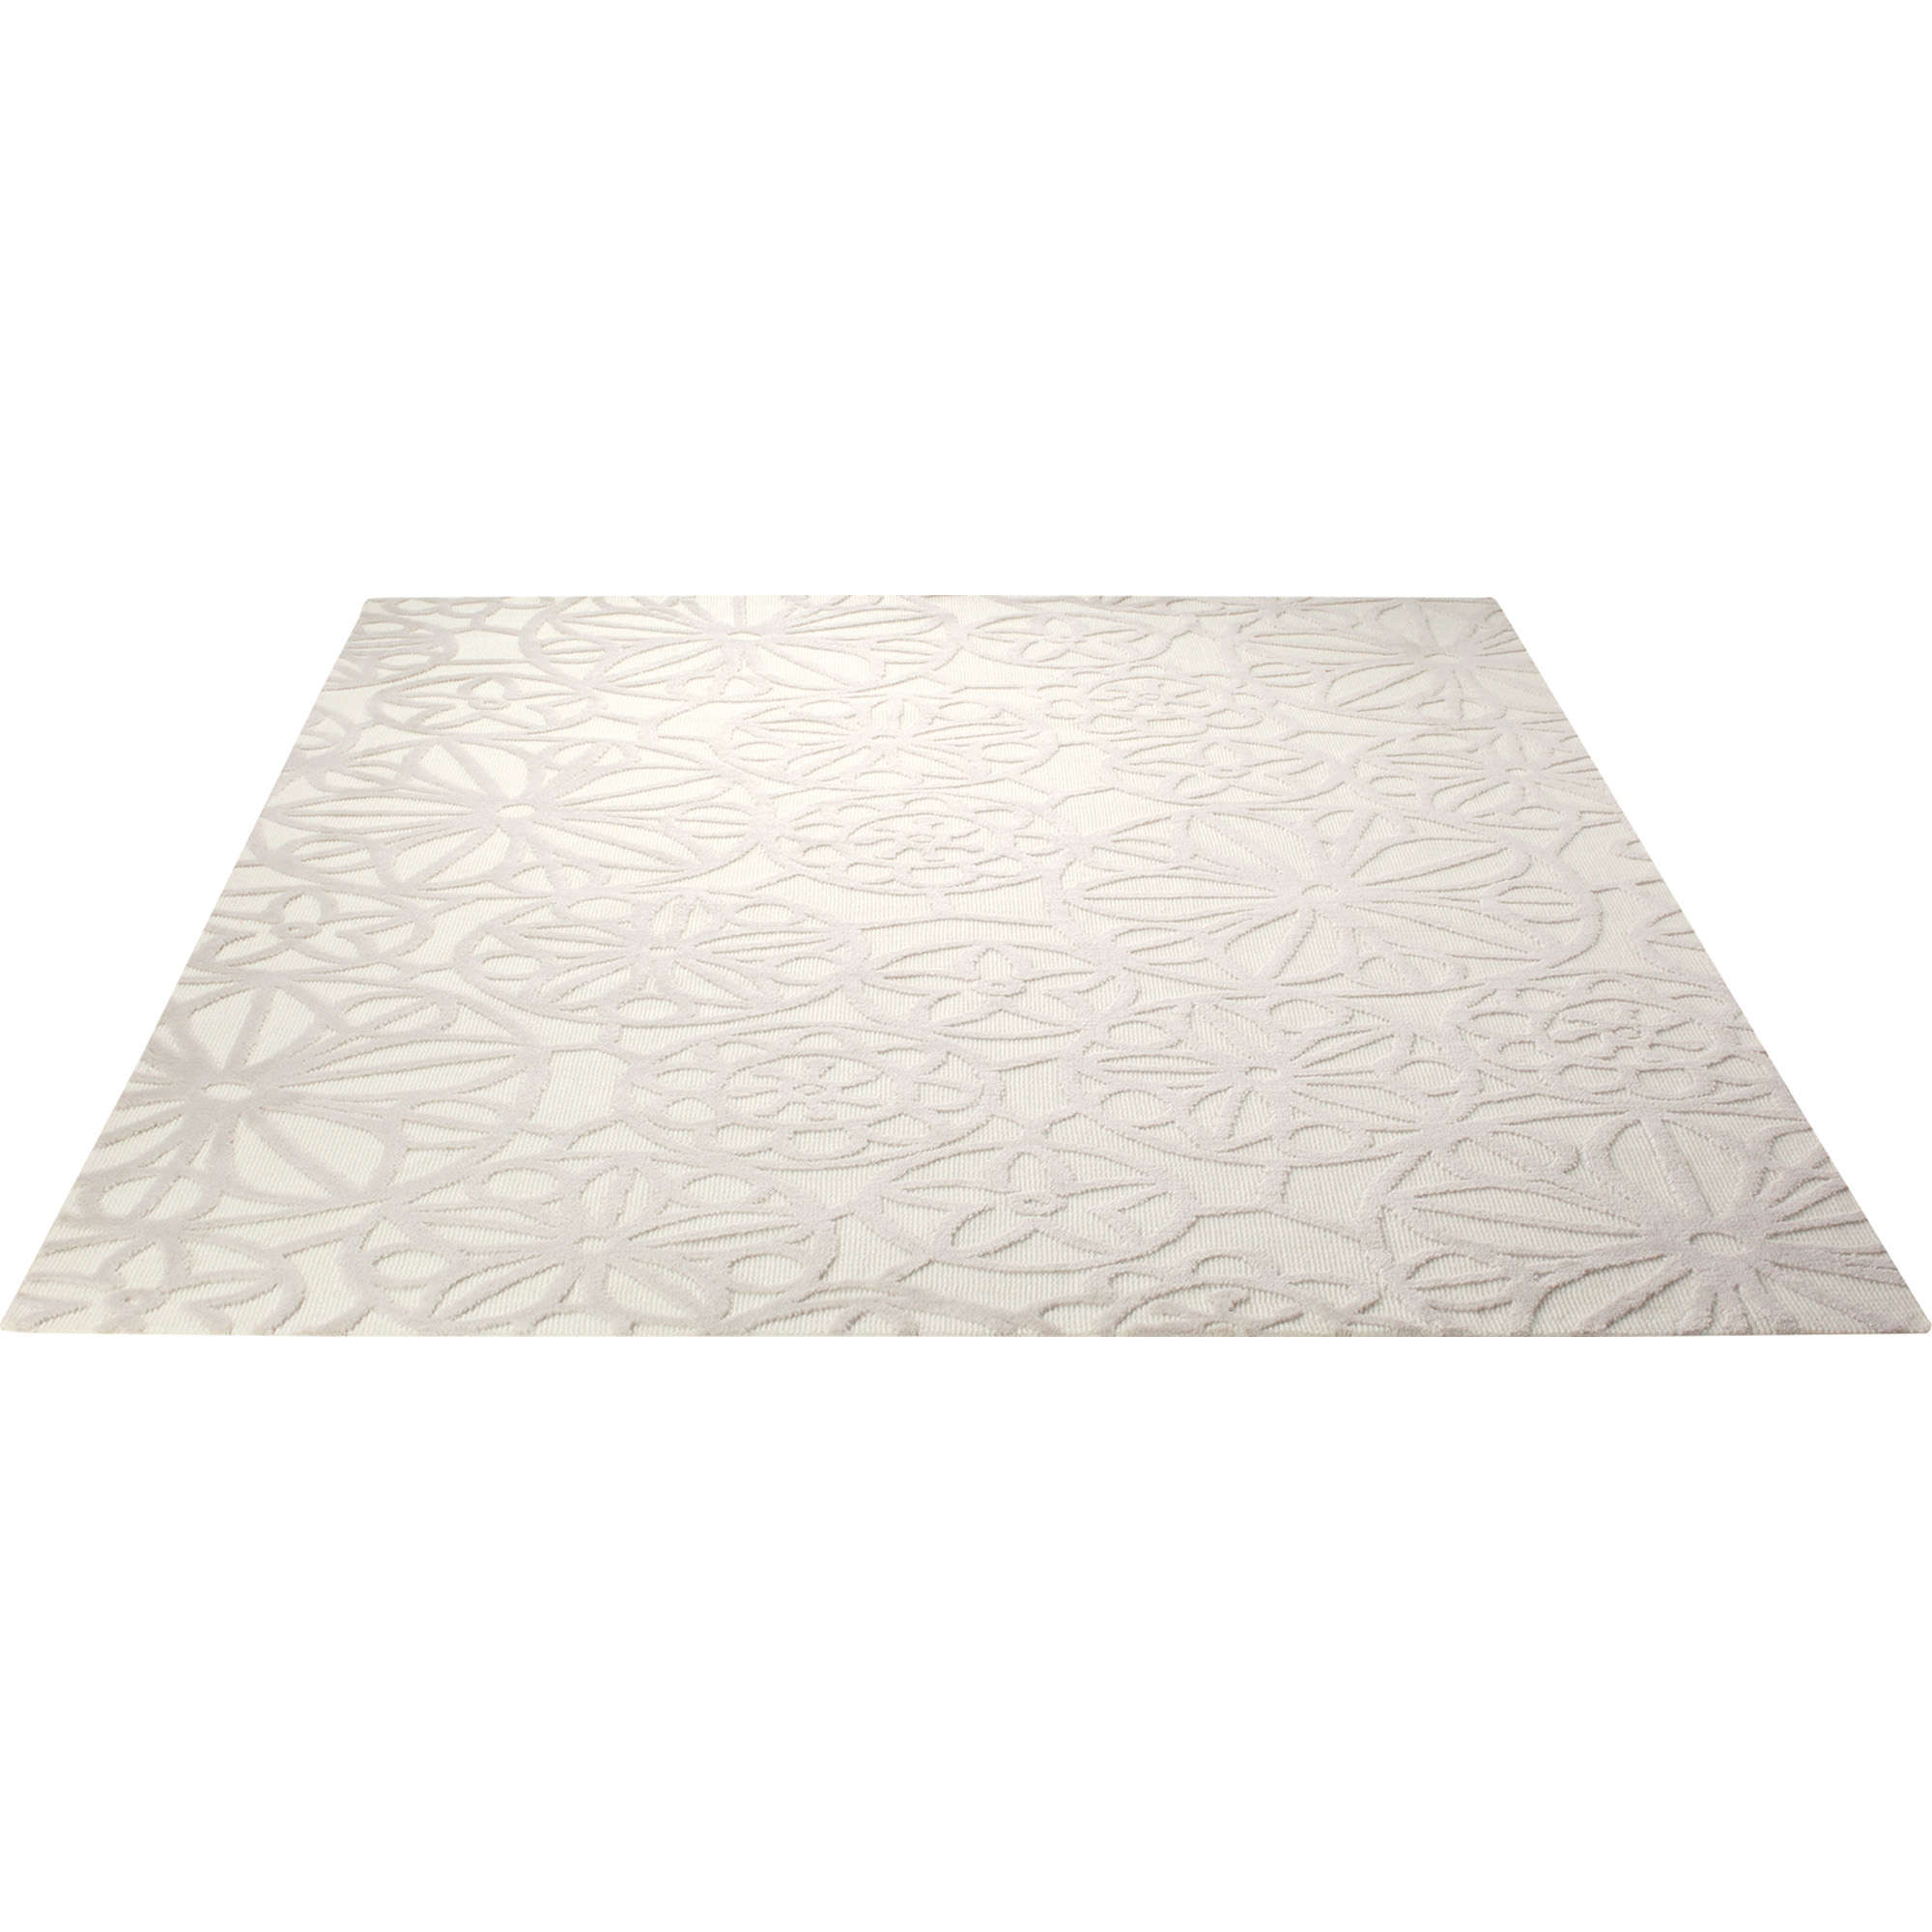 ESPRIT Teppich maschinengewebt  eB